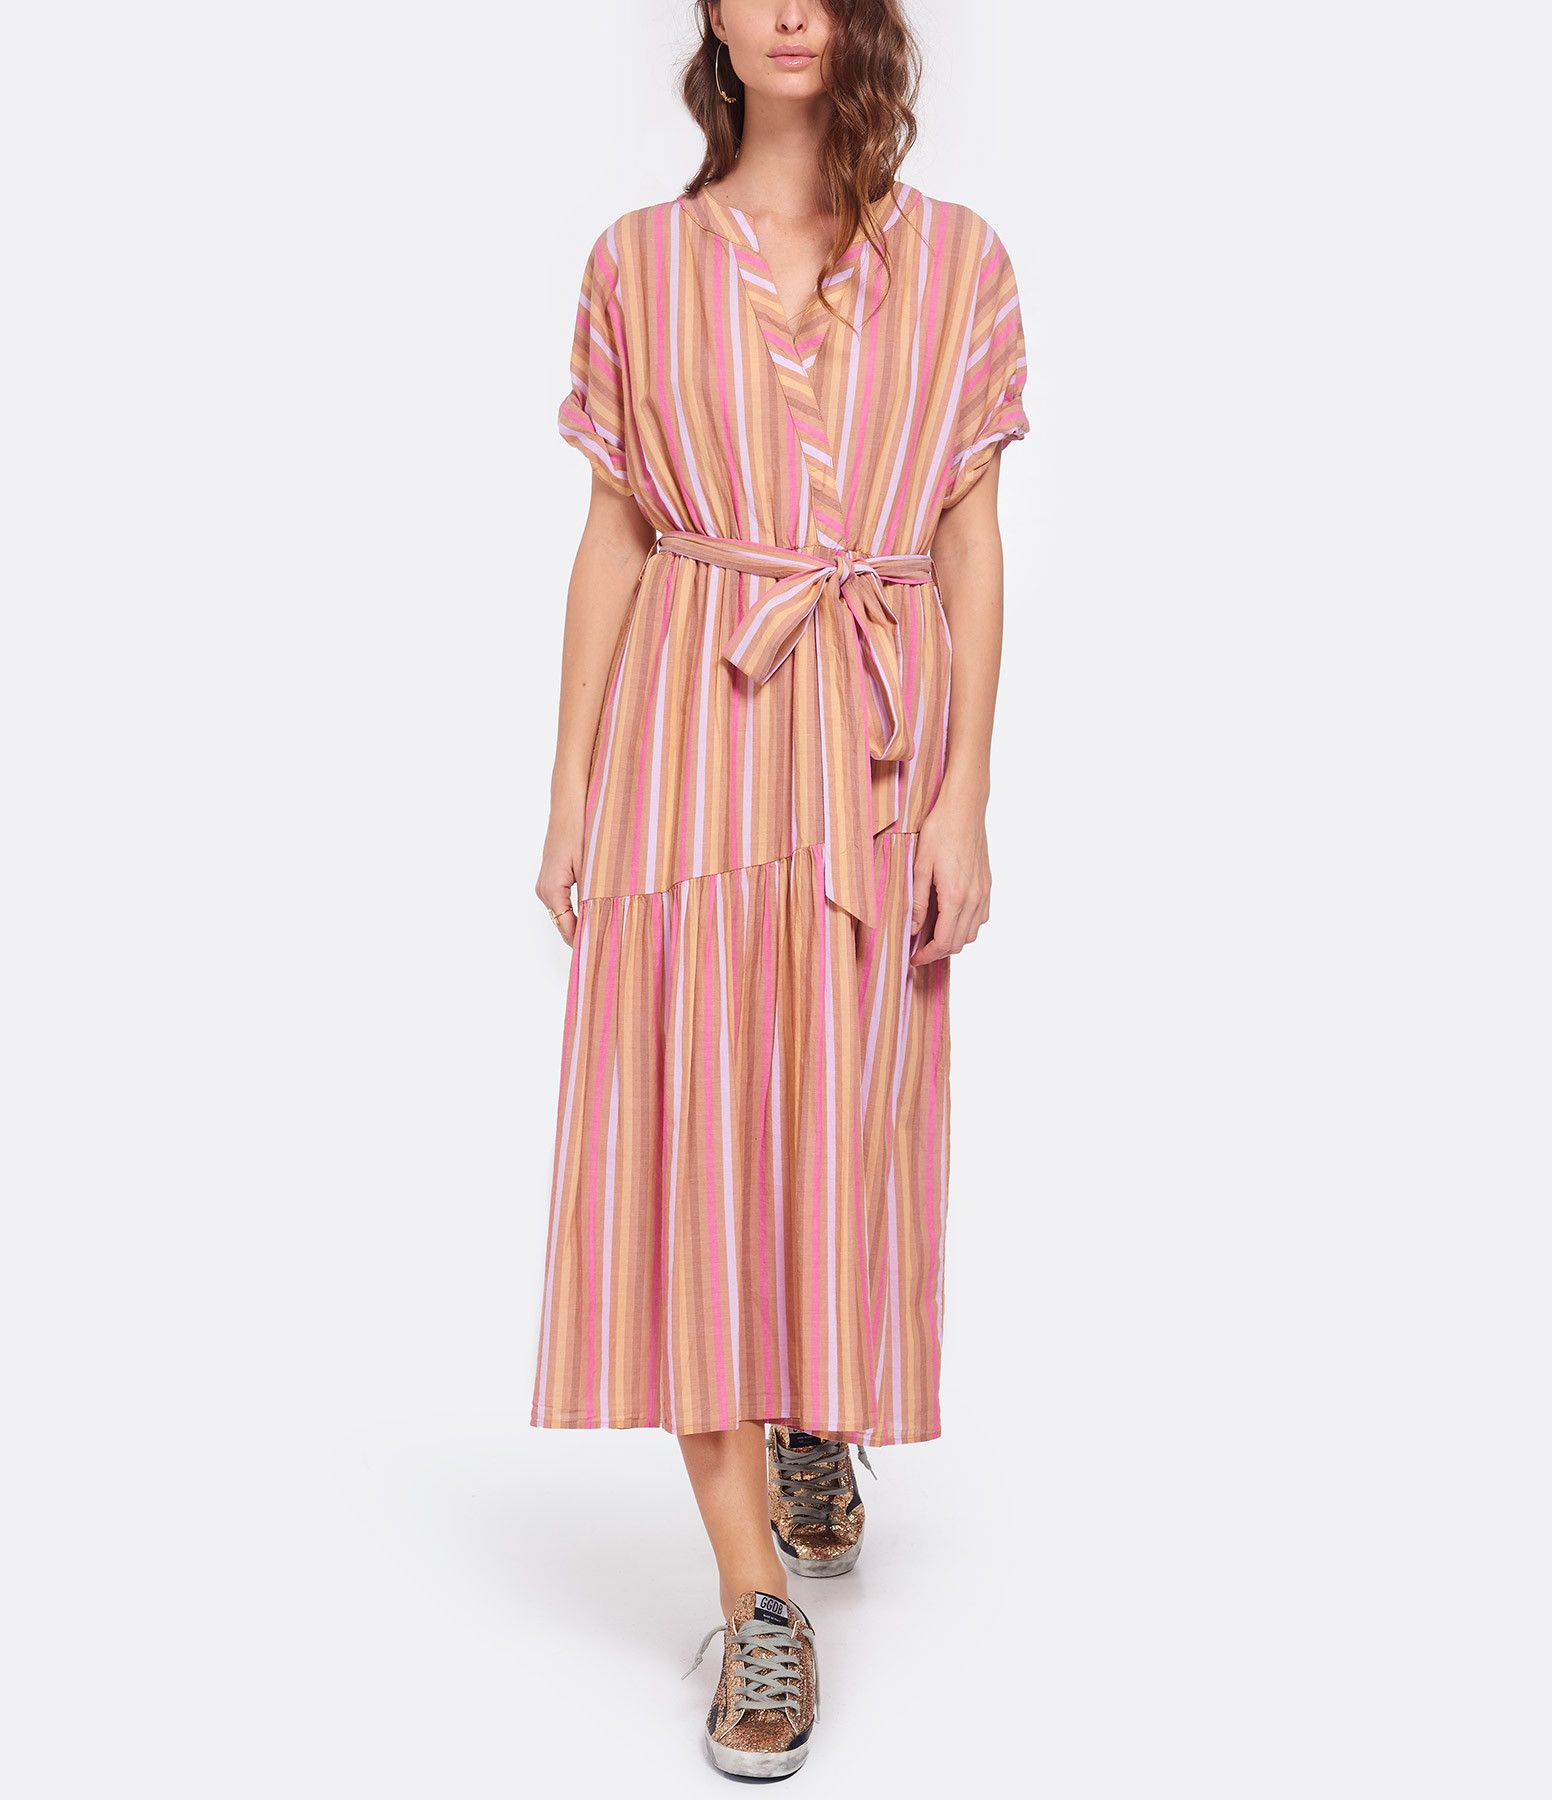 XIRENA - Robe Drue Rayures Coton Tuleries